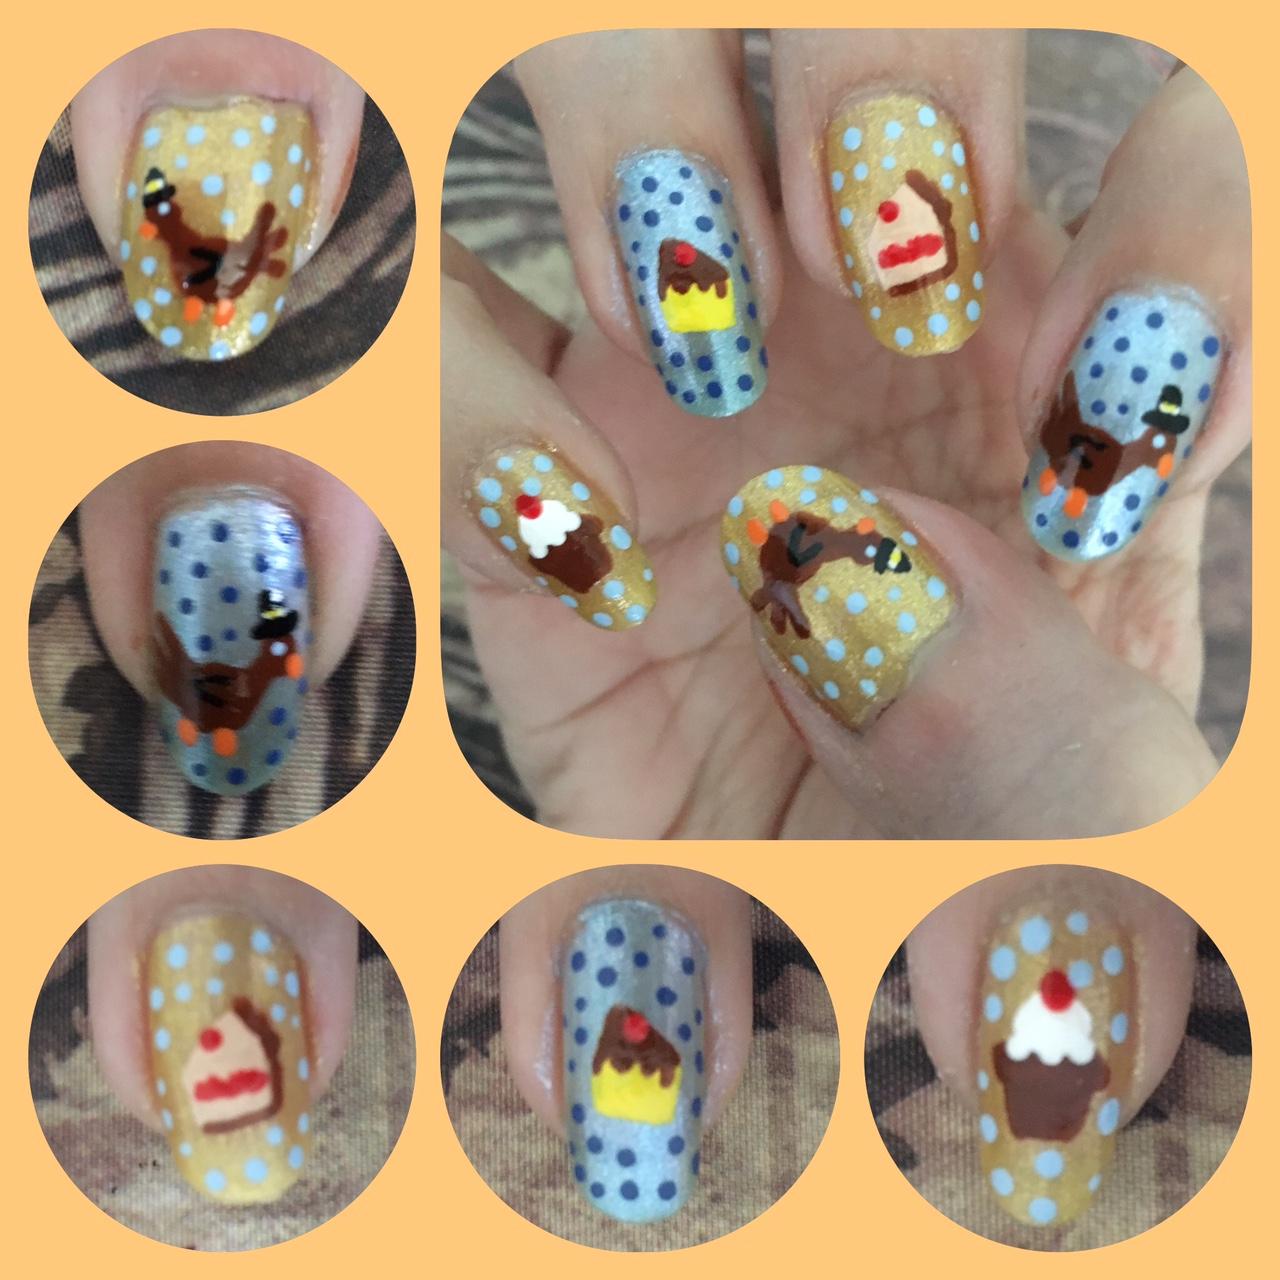 ThanksGiving Nail Art Right by AzureMikari